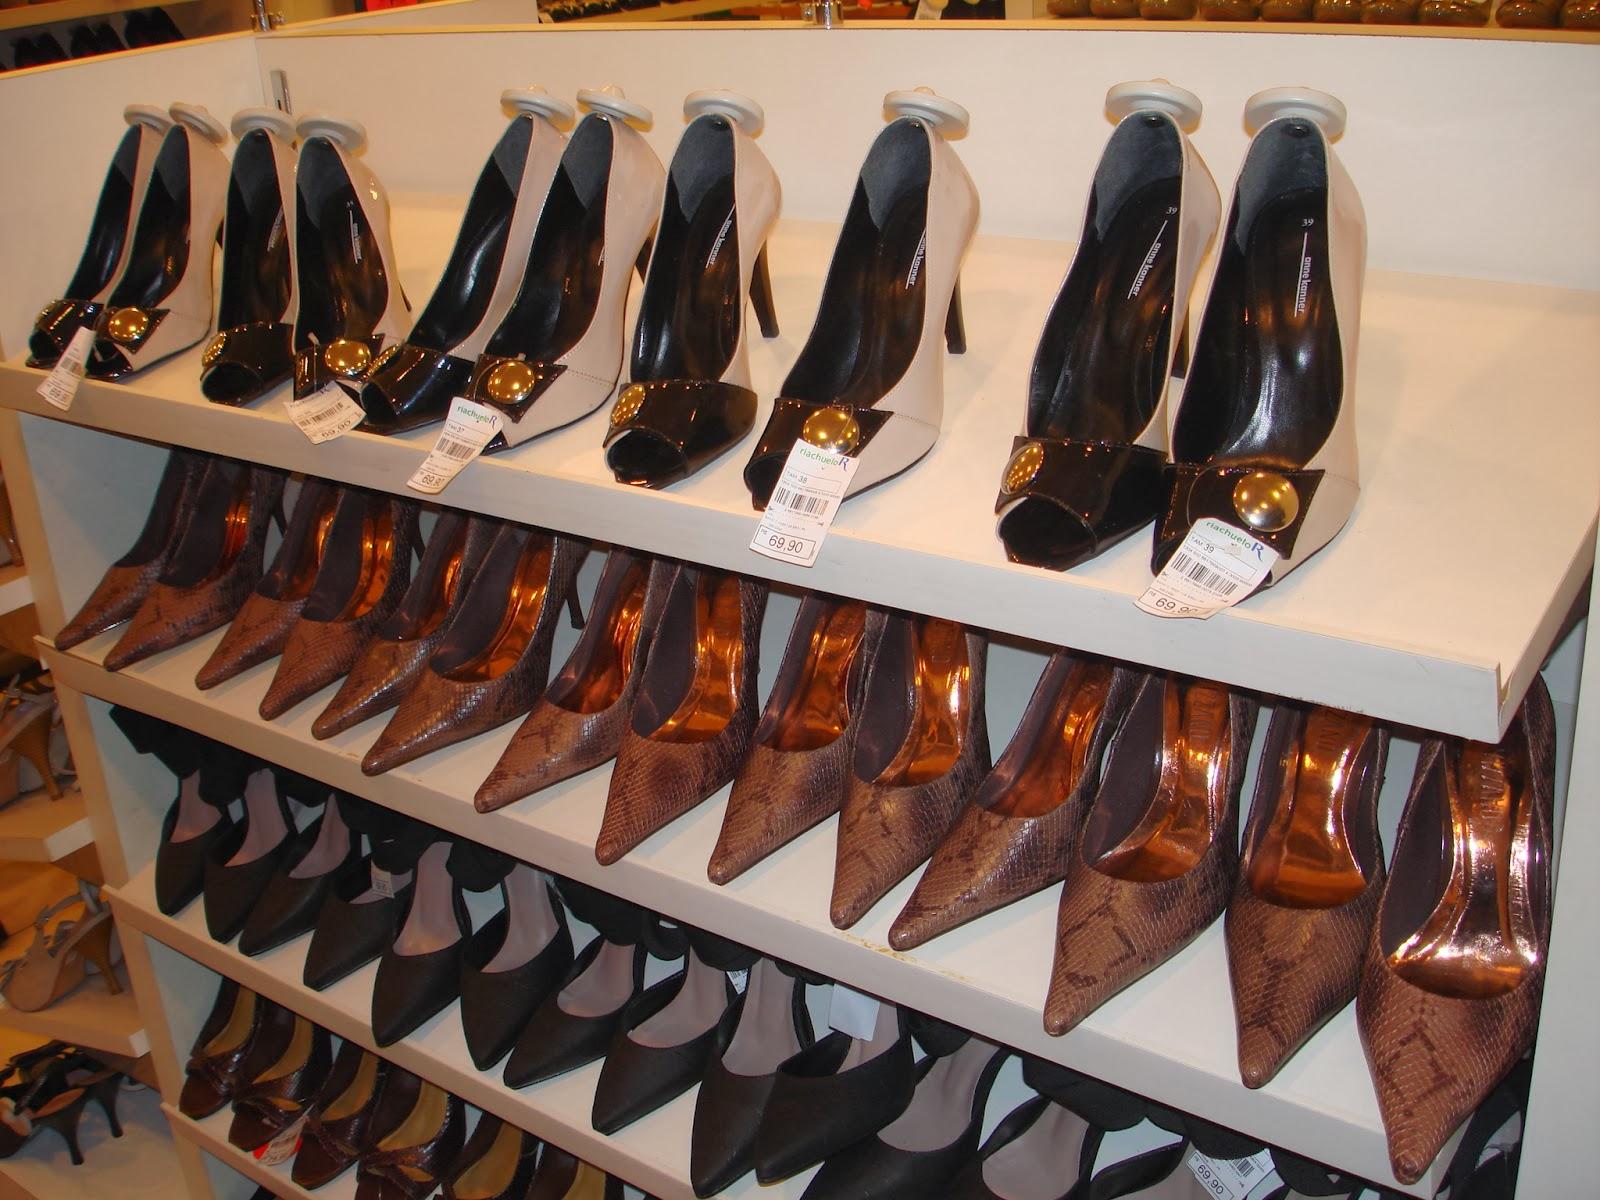 da Achados Belusca Belusca Achados Achados da Riachuelo Belusca Sapatos  Riachuelo Sapatos da Sapatos XxCwCYqfU 54a7c60ad9